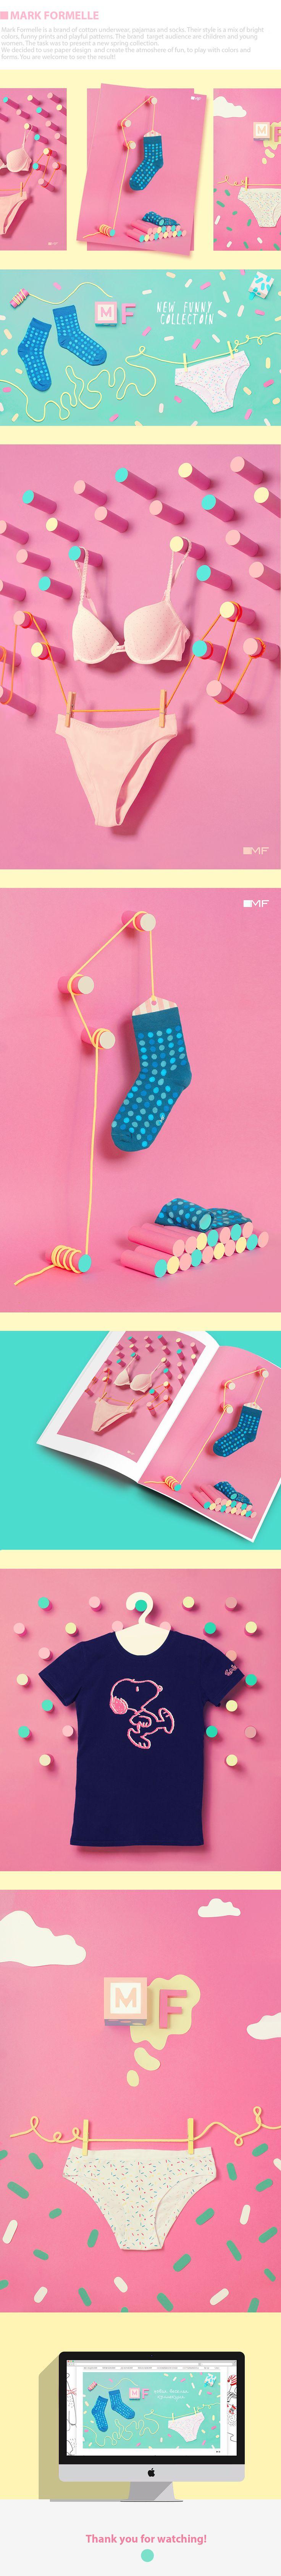 fashion set | fashion photo| product photo | flat photo | flat design | socks | women underwear | COTTON STORIES on Behance